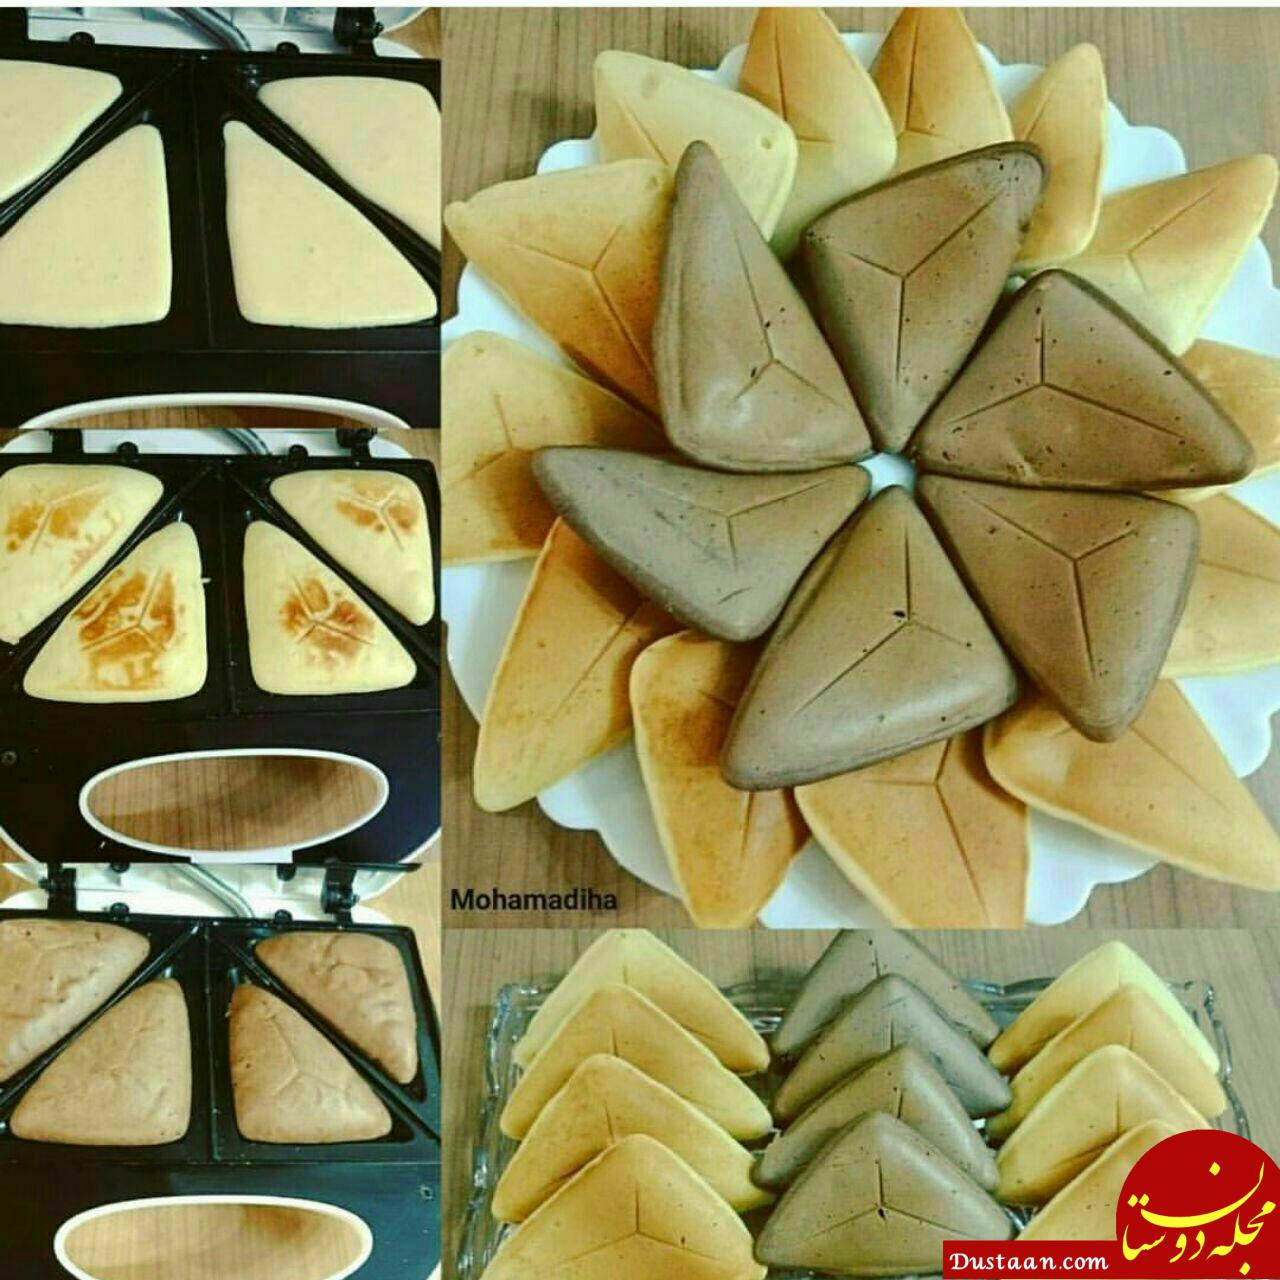 www.dustaan.com طرز تهیه کیک ساده مثلثی با ساندویچ ساز به سبکی خوشمزه